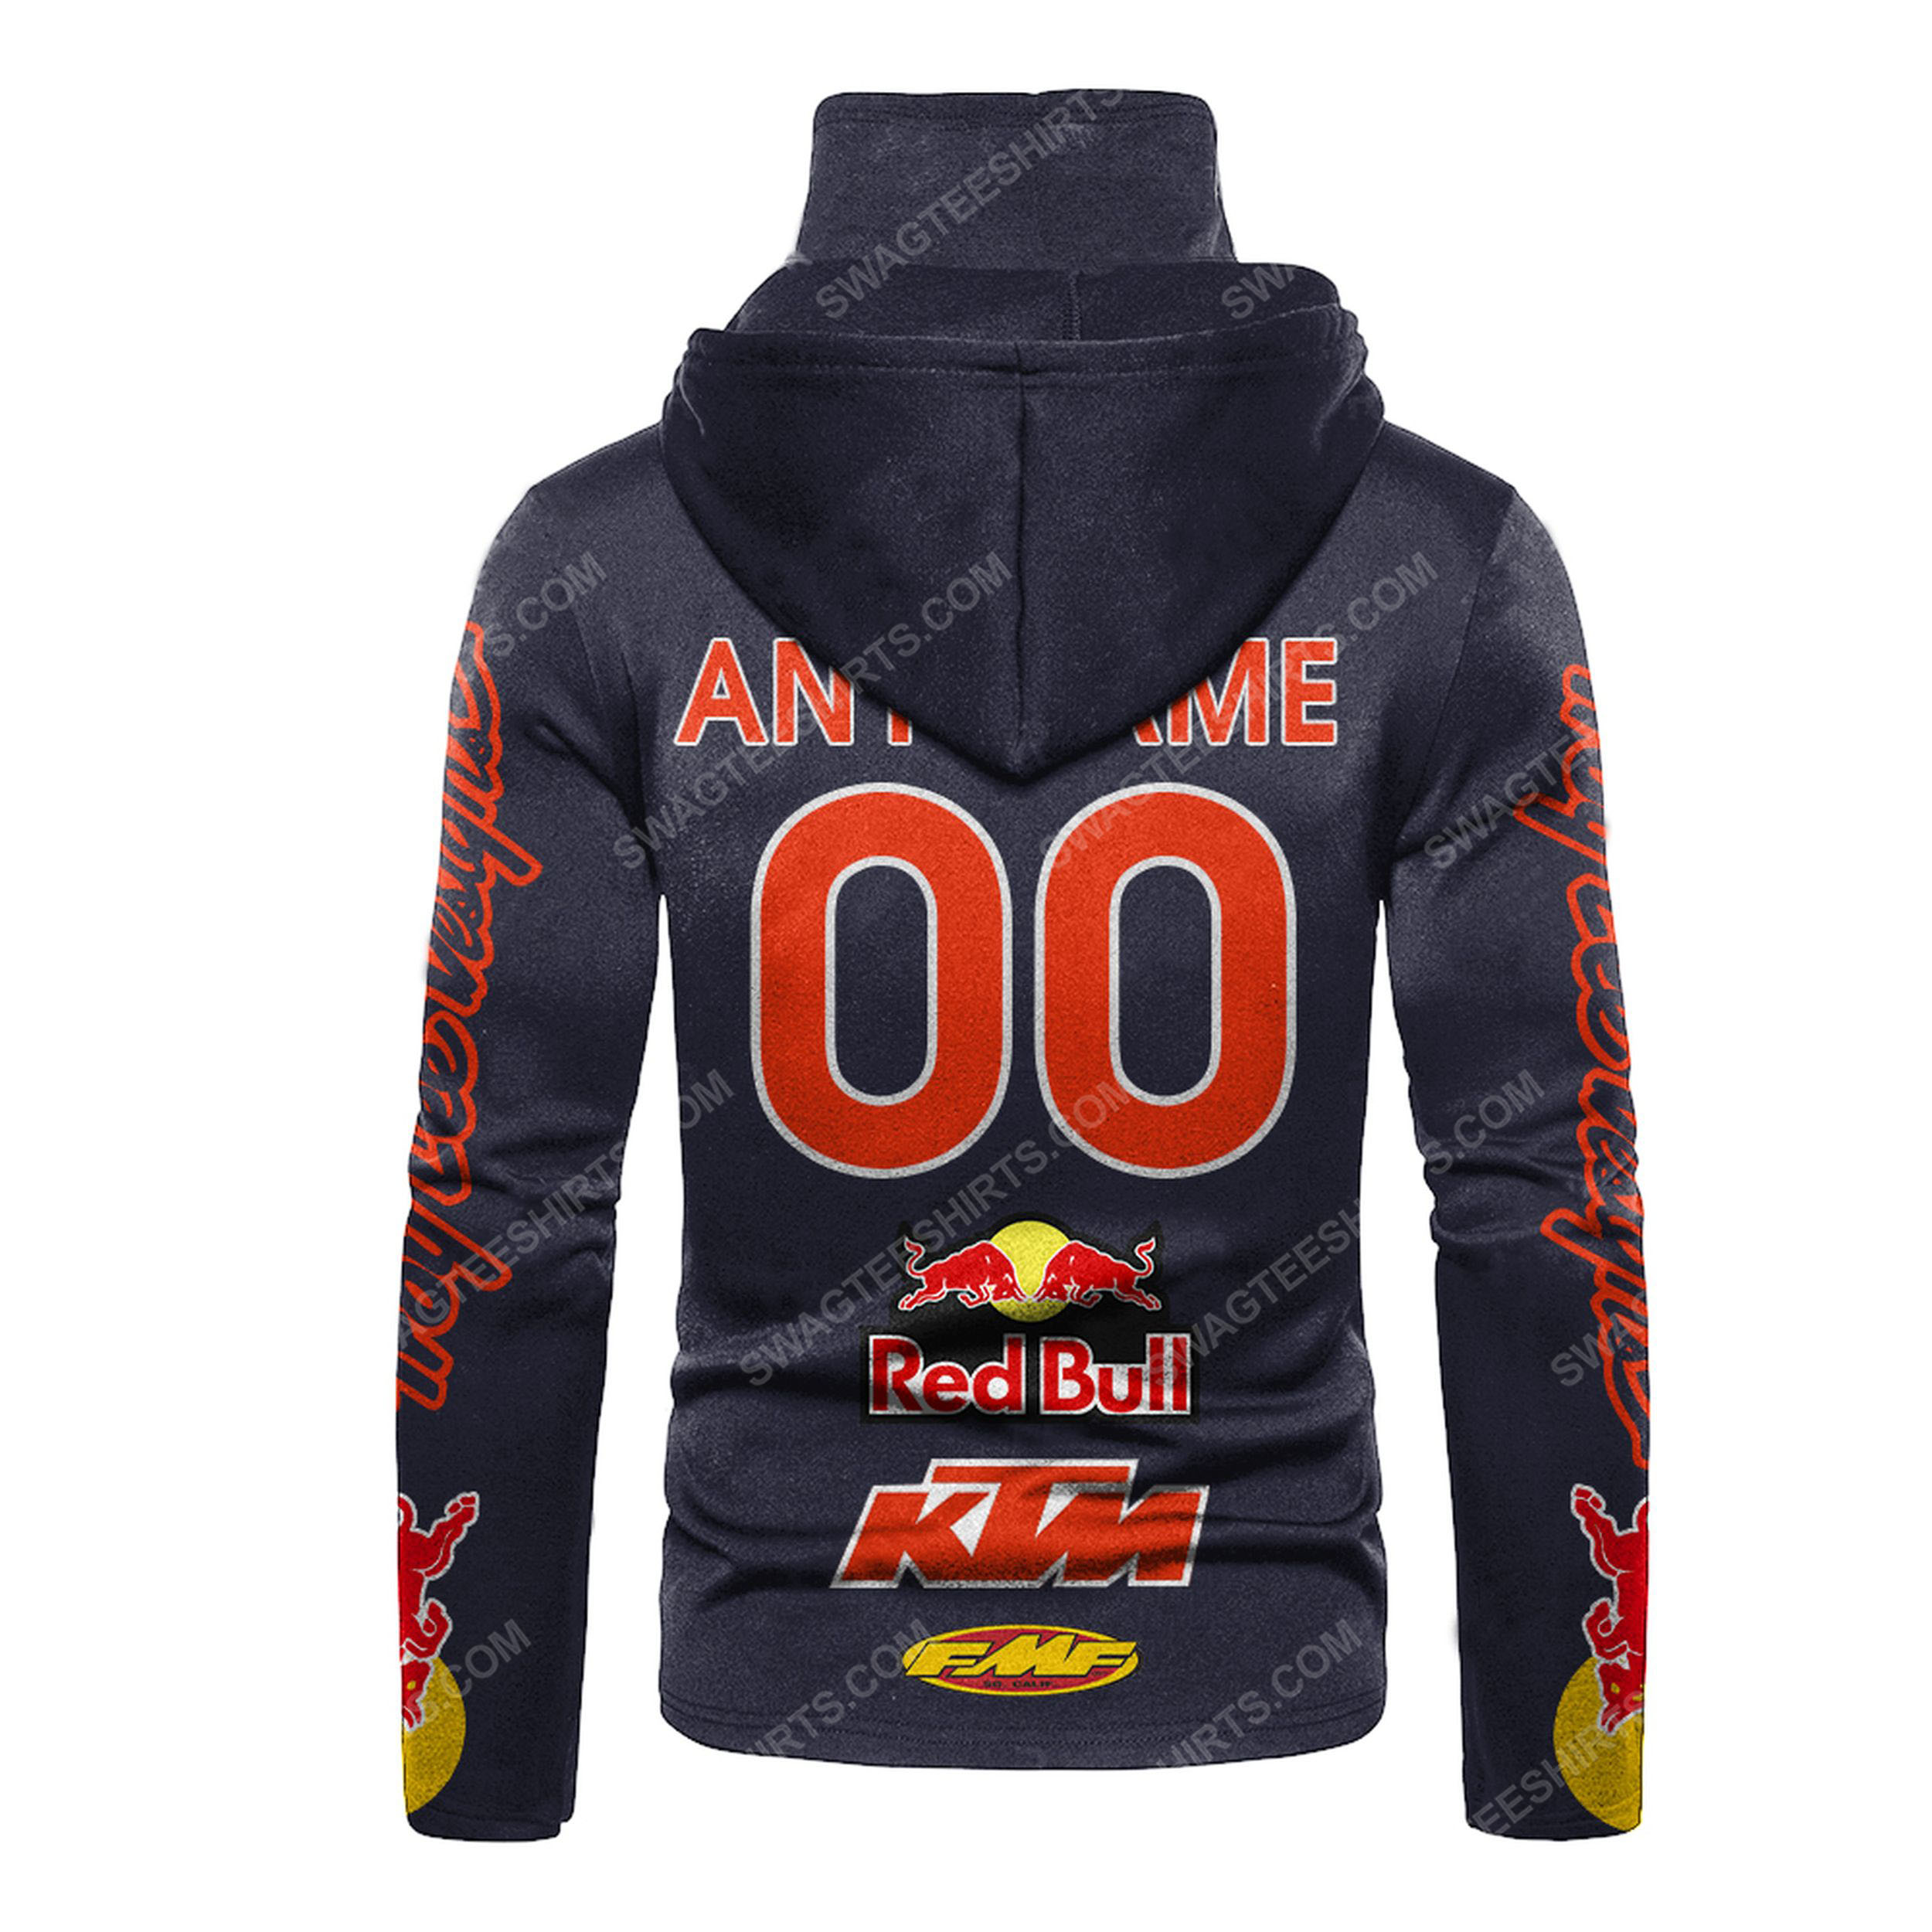 Custom name red bull ktm factory racing full print mask hoodie 3(1) - Copy